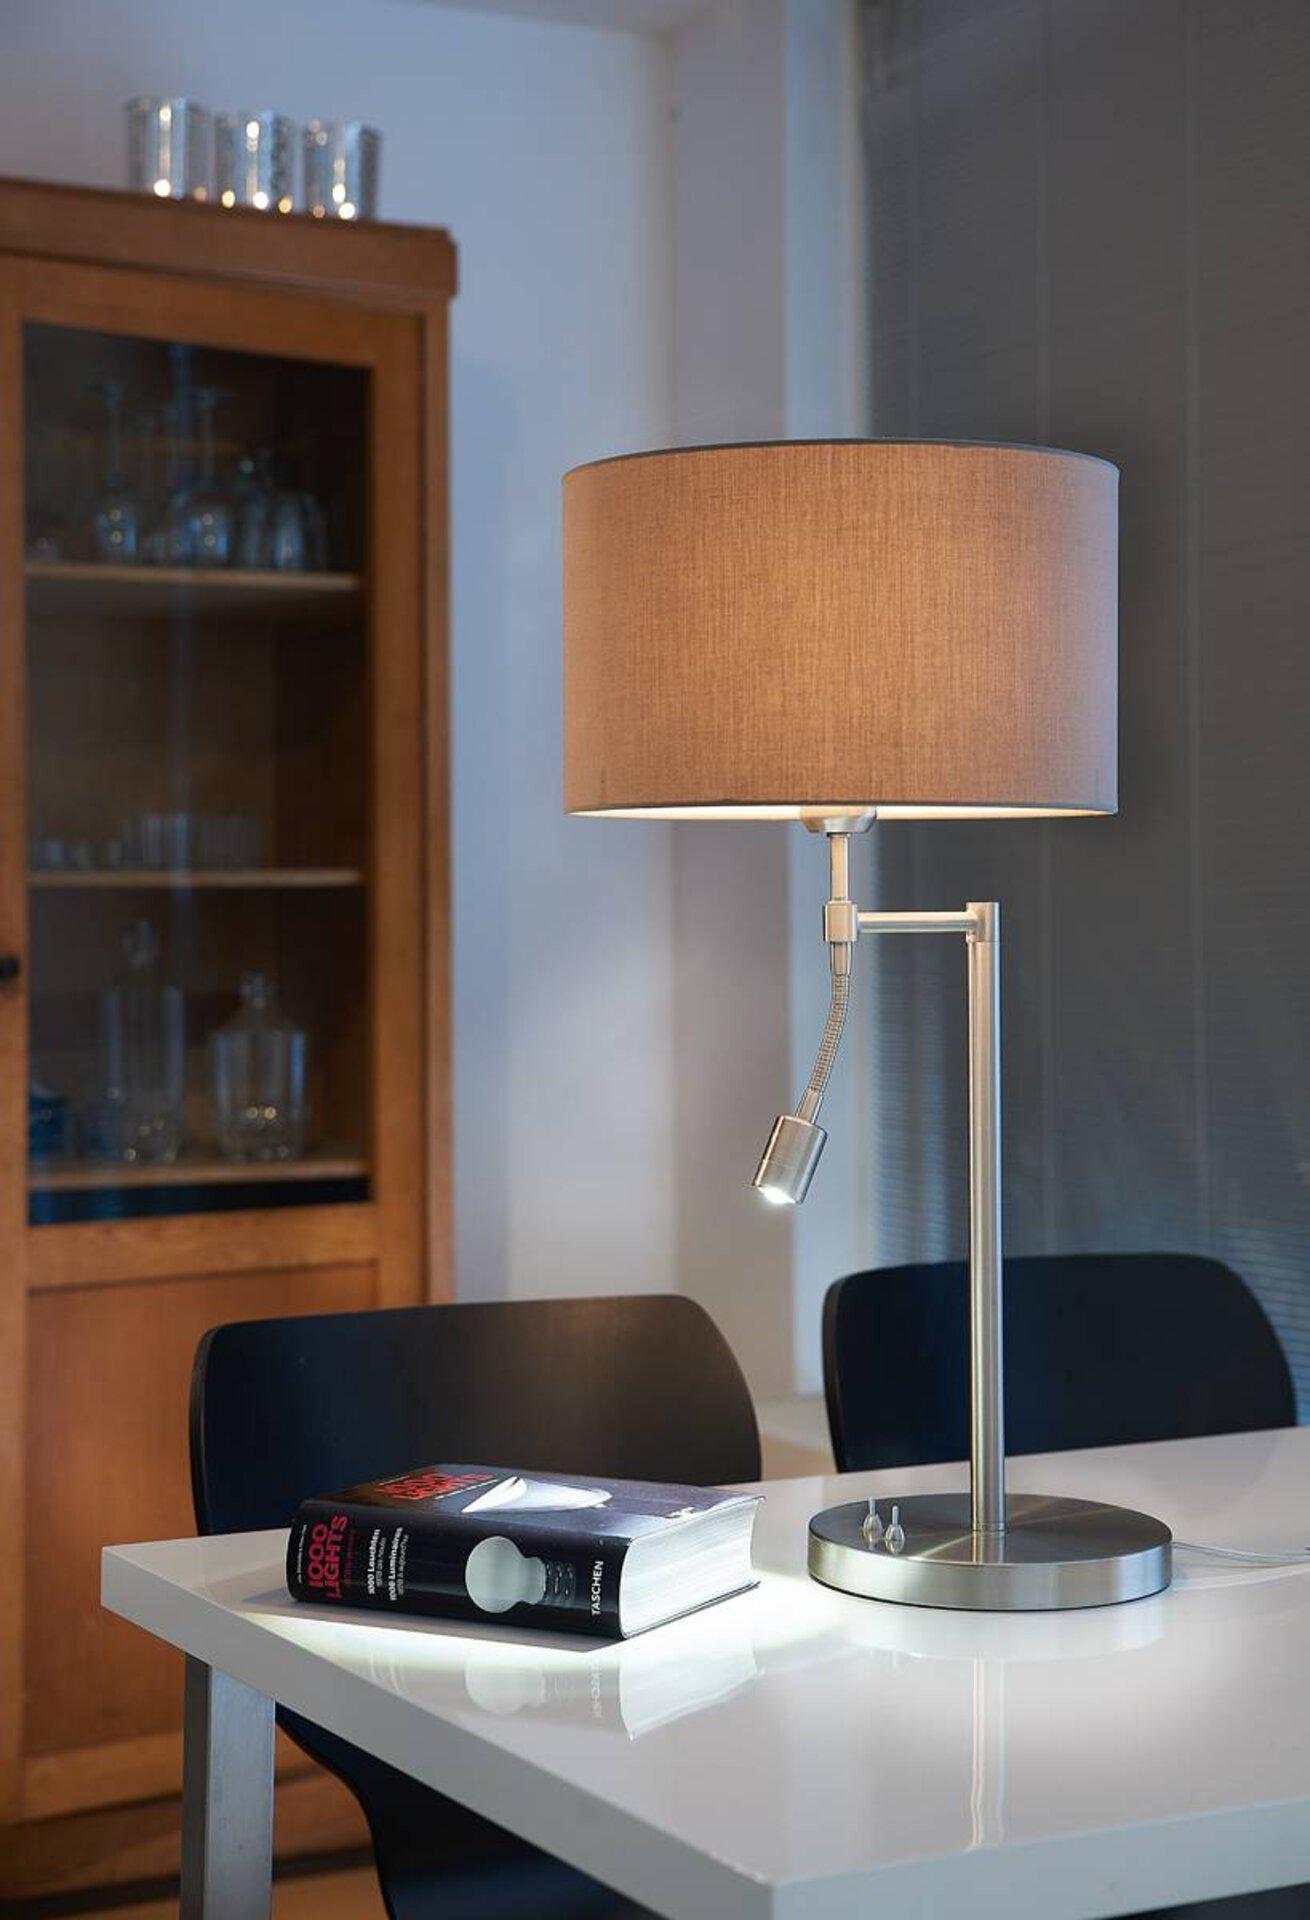 Tischleuchte CALGARY Light & Living Metall 20 x 46 x 20 cm